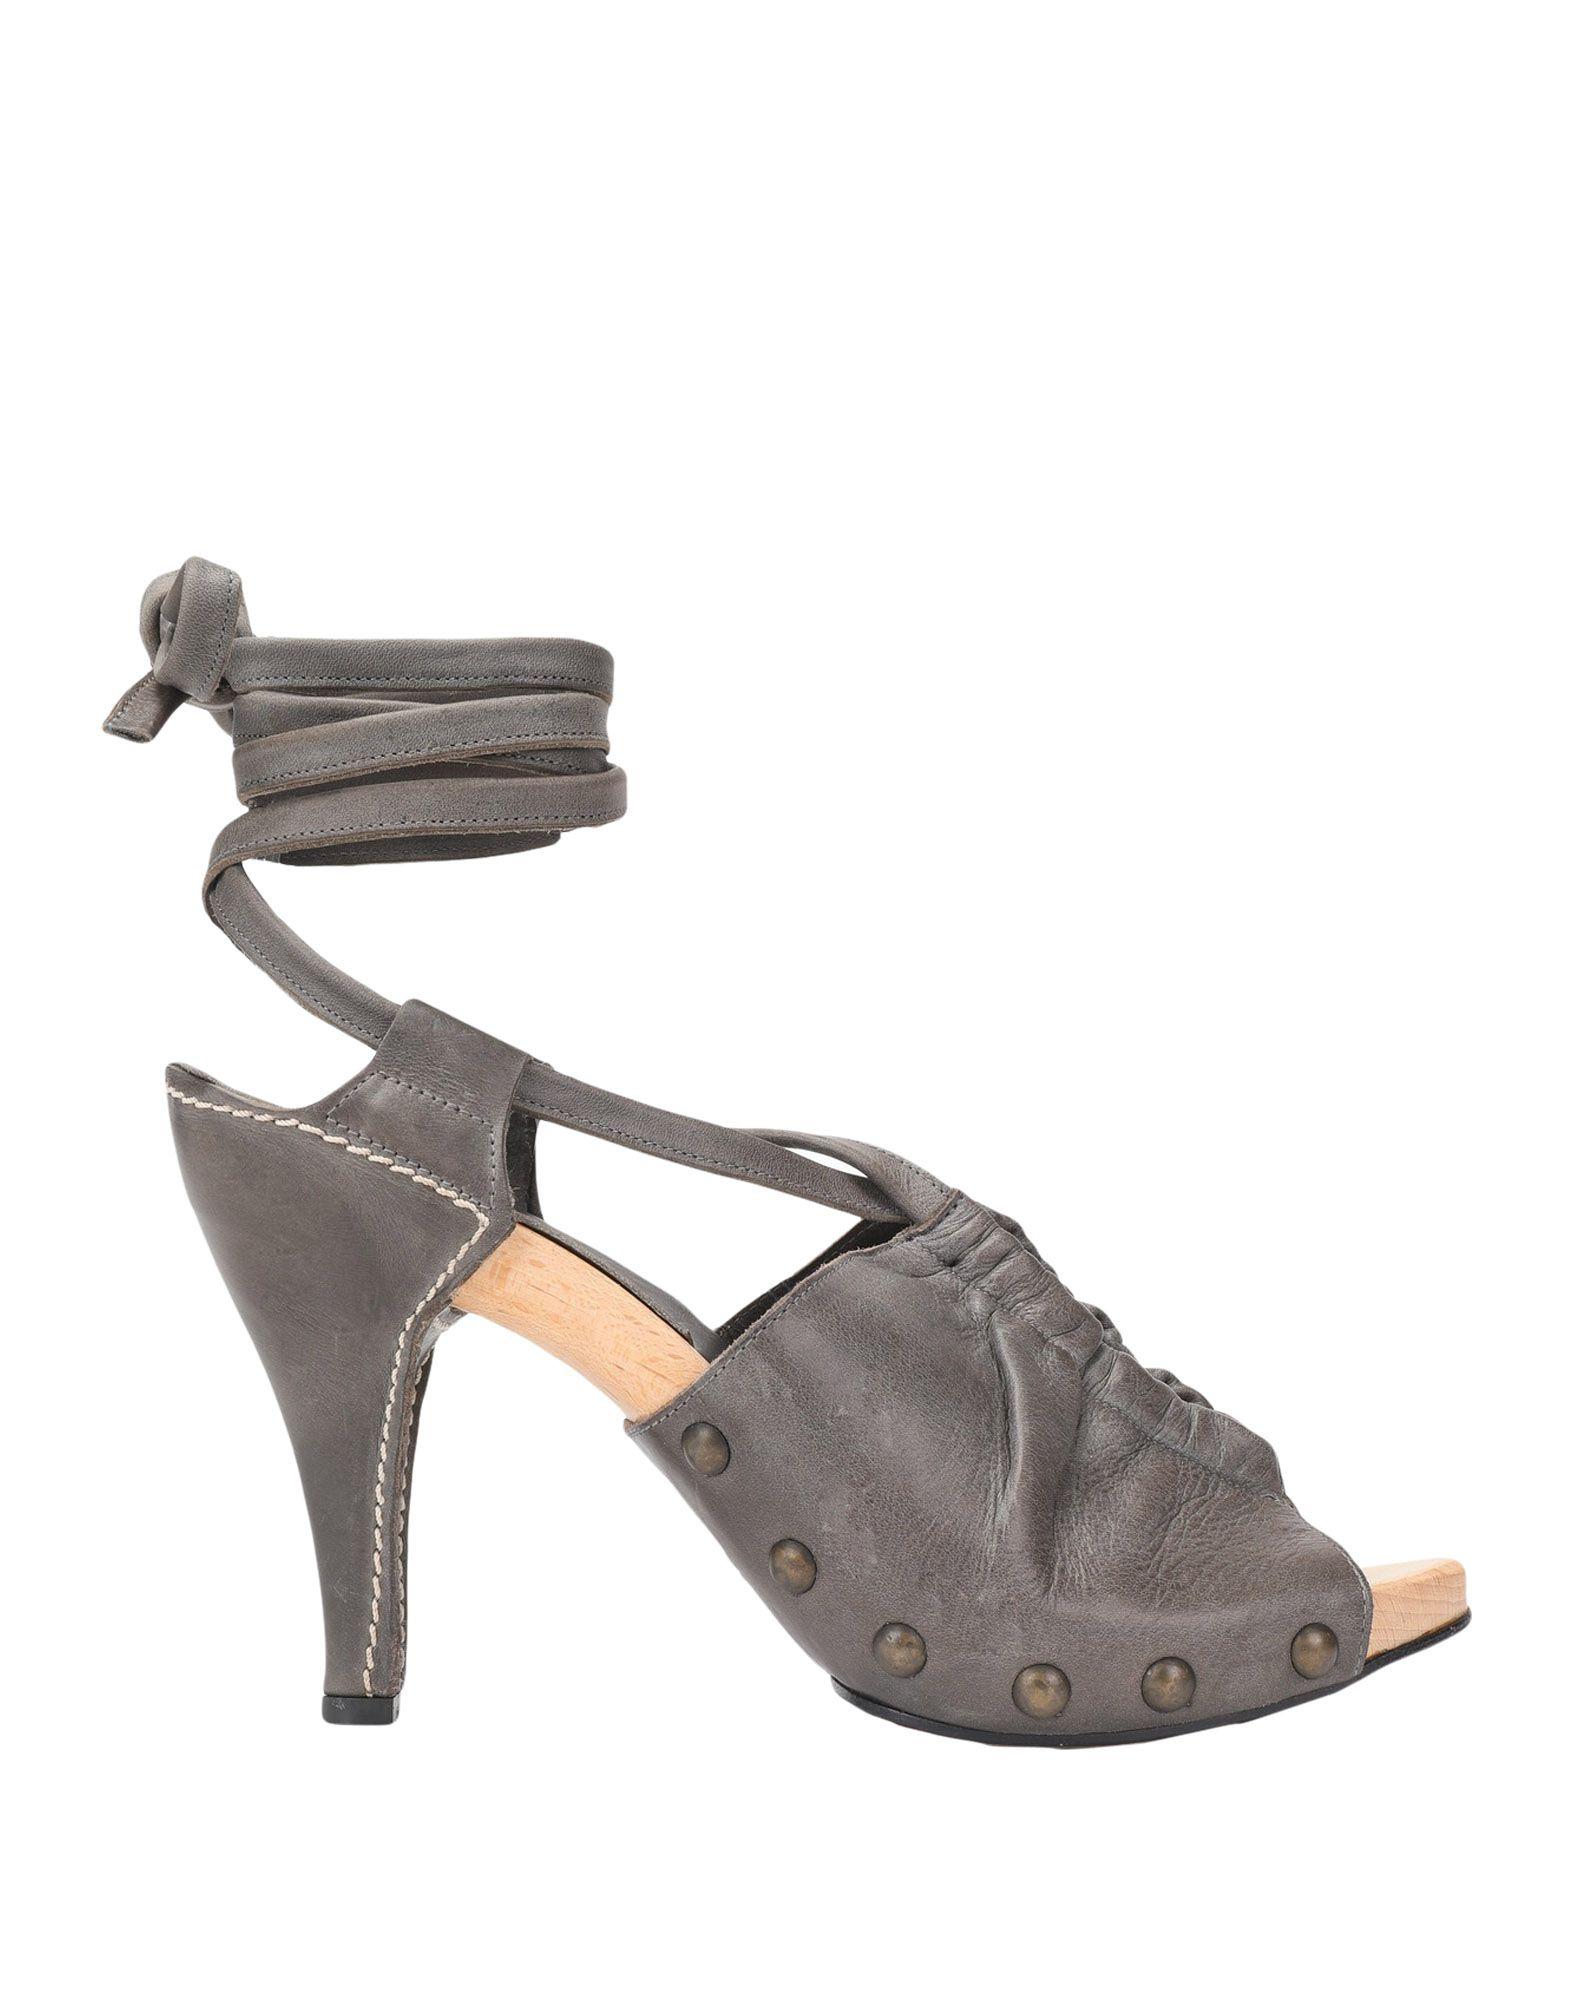 QSP+ QUELQUES SHOES DE PLUS Сандалии meotina high heels women shoes 2018 bow knot pointed toe party shoes pumps block high heels slip on ladies shoes plus size 43